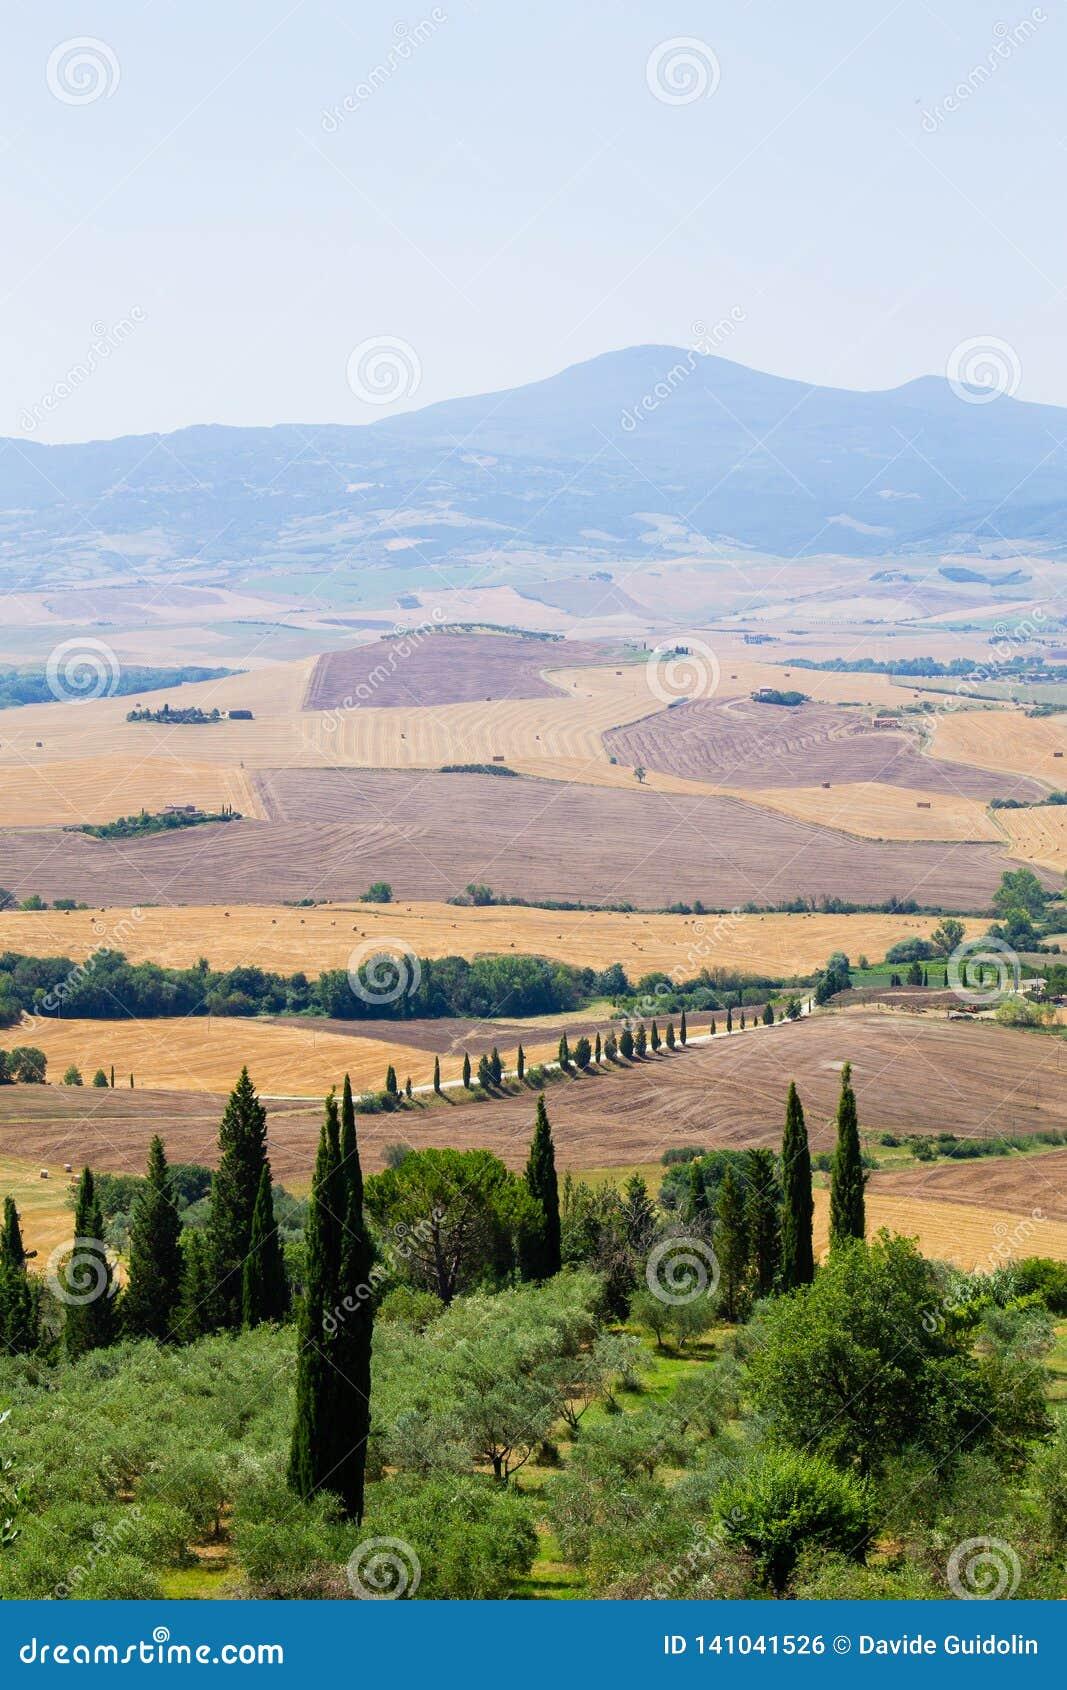 Tuscany Hills Panorama Summer View Italian Landscape Stock Photo